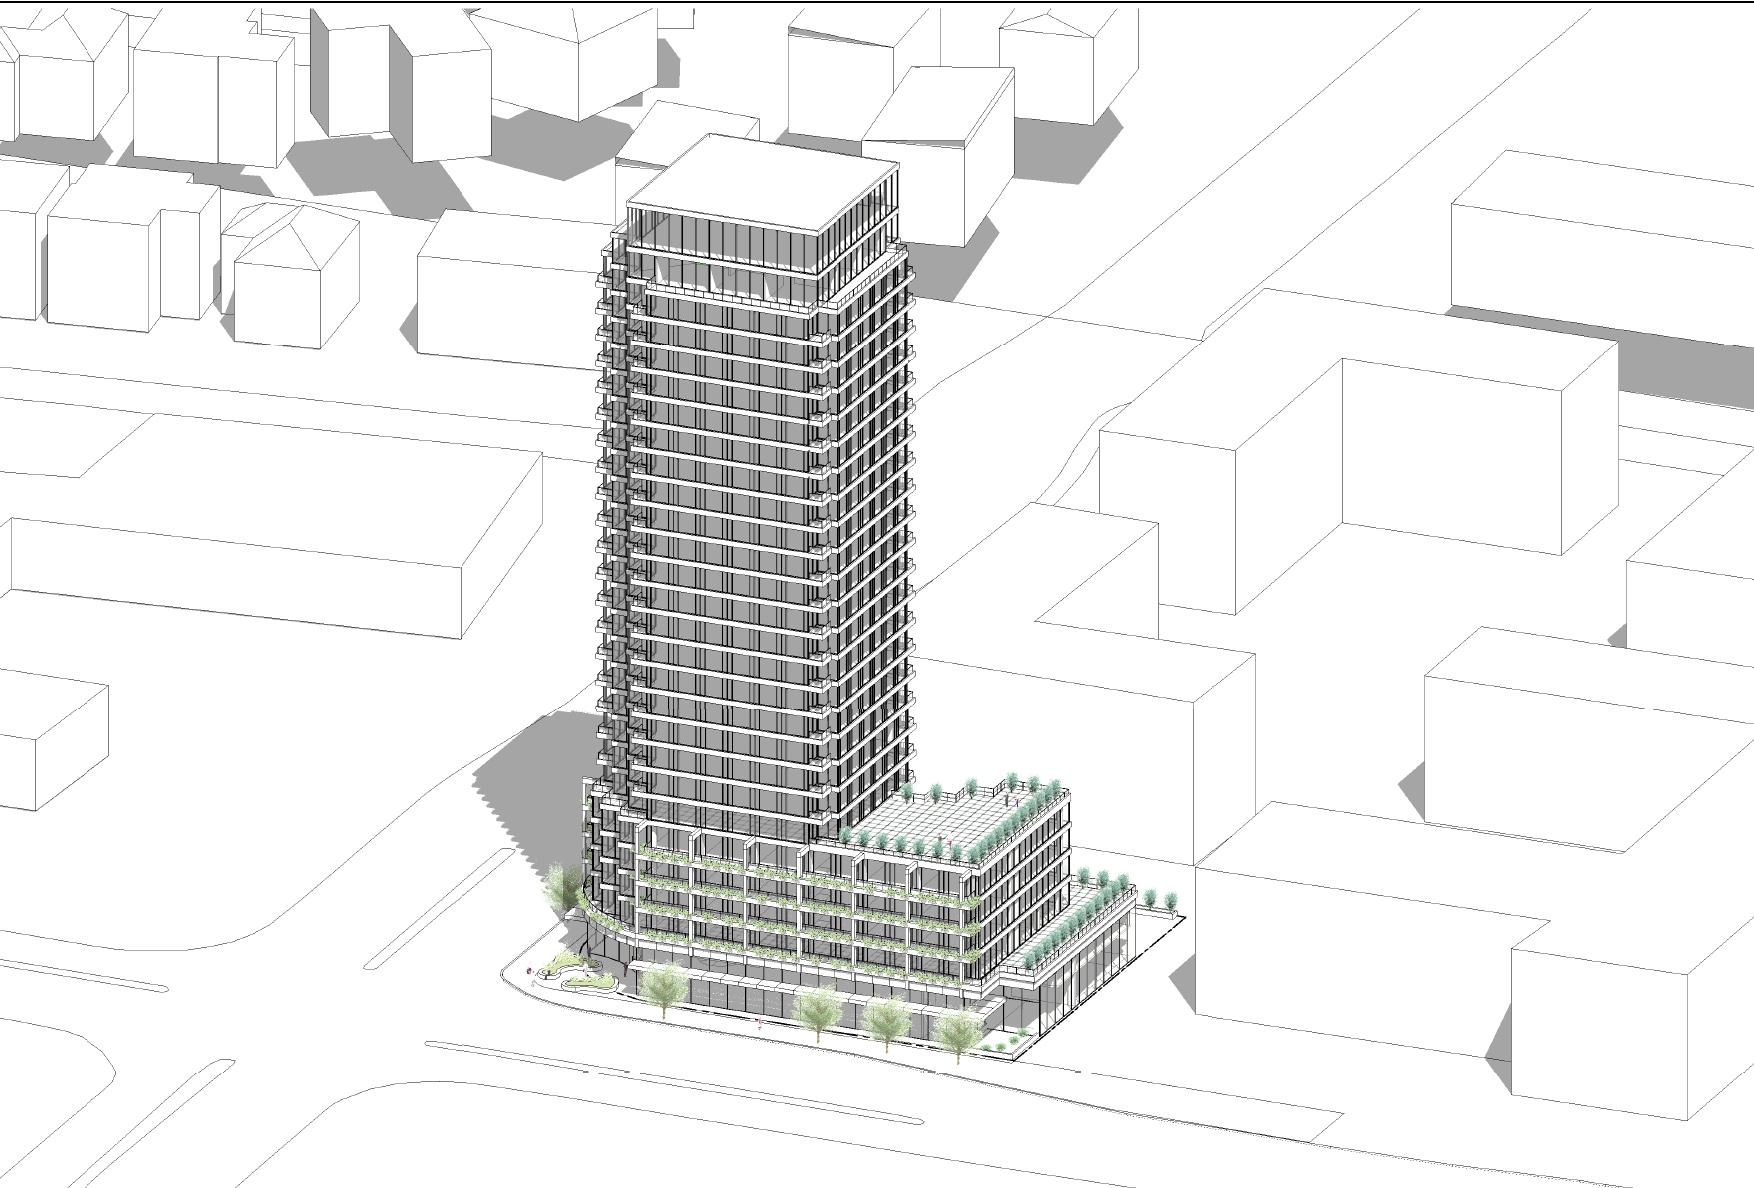 4926 Bathurst Street, Toronto, designed by IBI Group for Portal Developments Ltd.